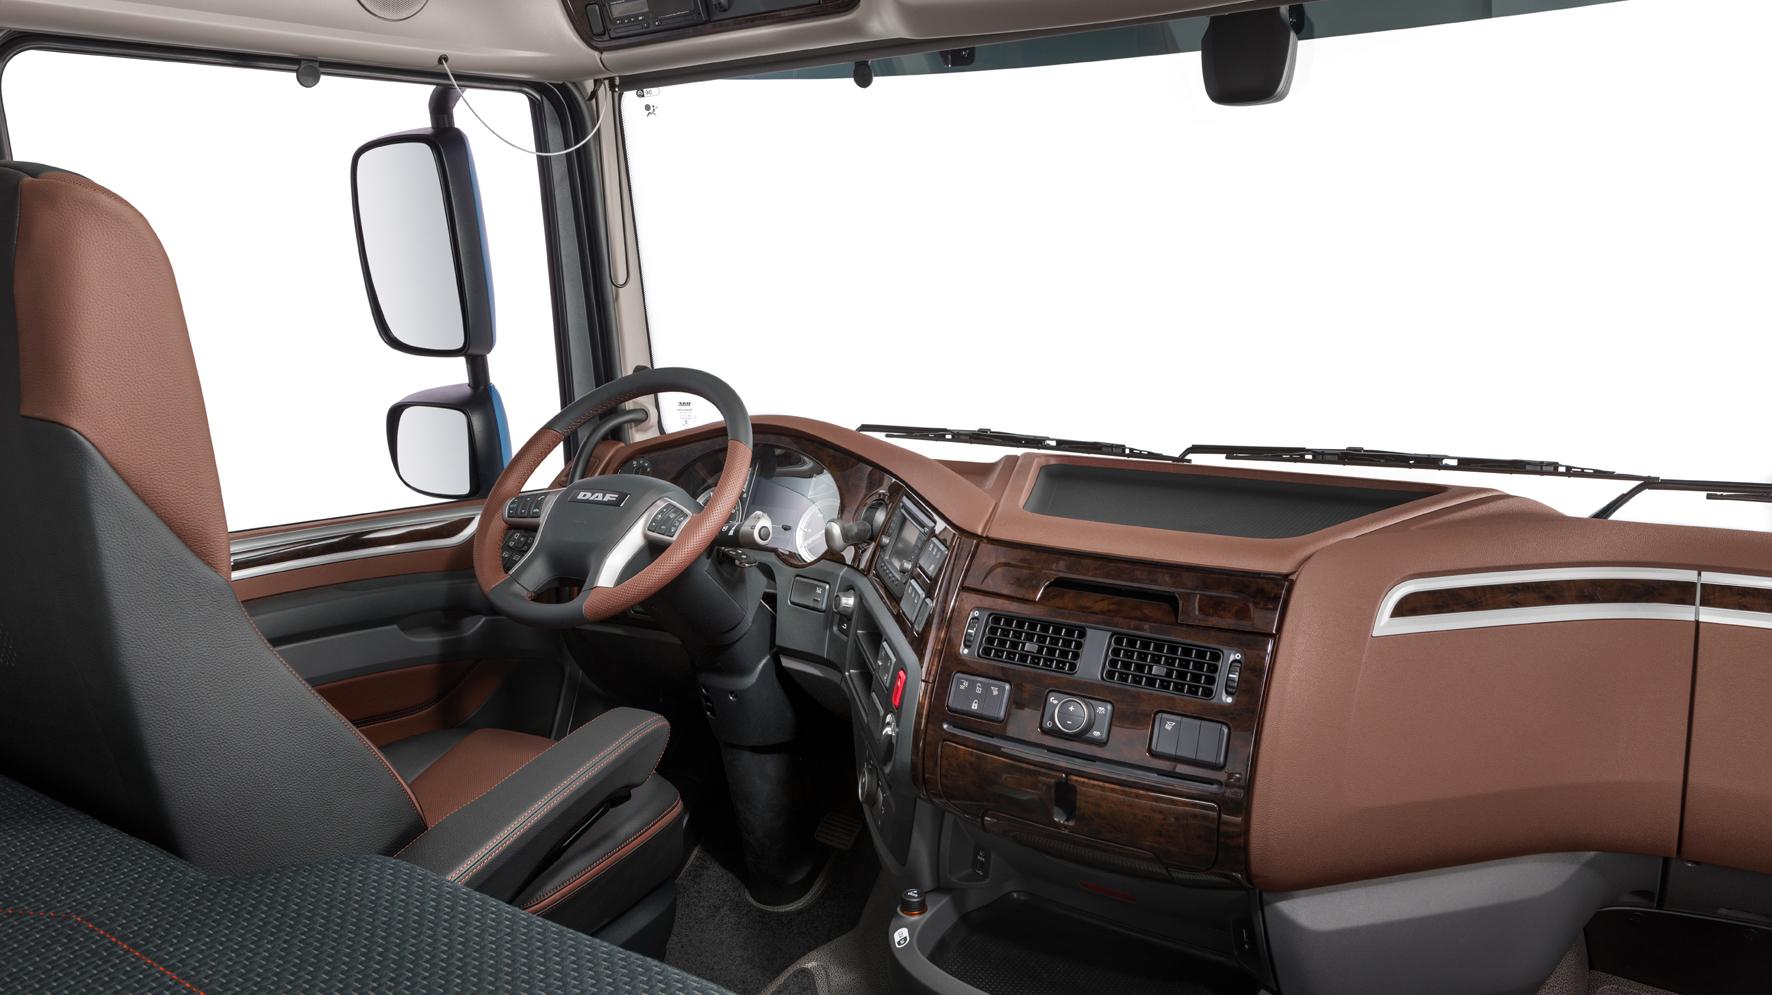 https://www.dafsrbija.rs/_/media/images/daf%20trucks/trucks/euro%206/2017/pers-kit/23-2017-New-DAF-XF-Exclusive-Line-Interior.jpg